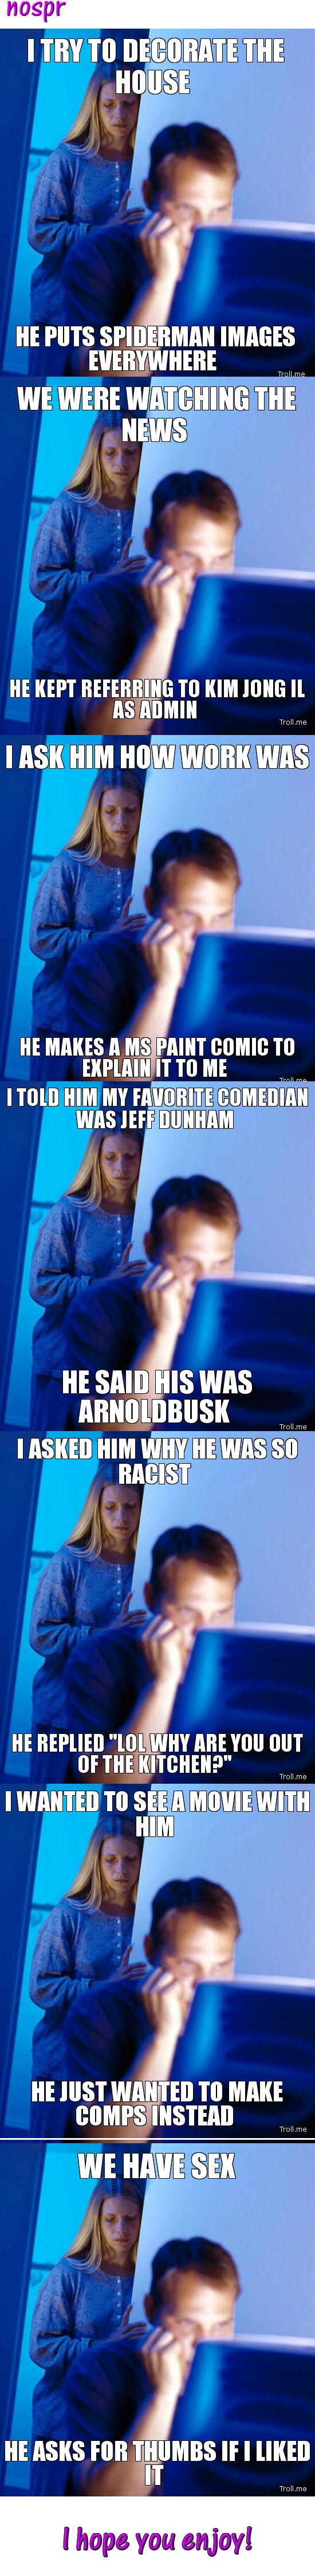 FunnyJunk Addicted Husband 2 (OC). (OC) I hope you guys like this one! www.funnyjunk.com/funny_pictures/2227885/FunnyJunk+Addicted+Husband+3+OC/. HE HITS IMAGES FUNNYJUNK ADDICT